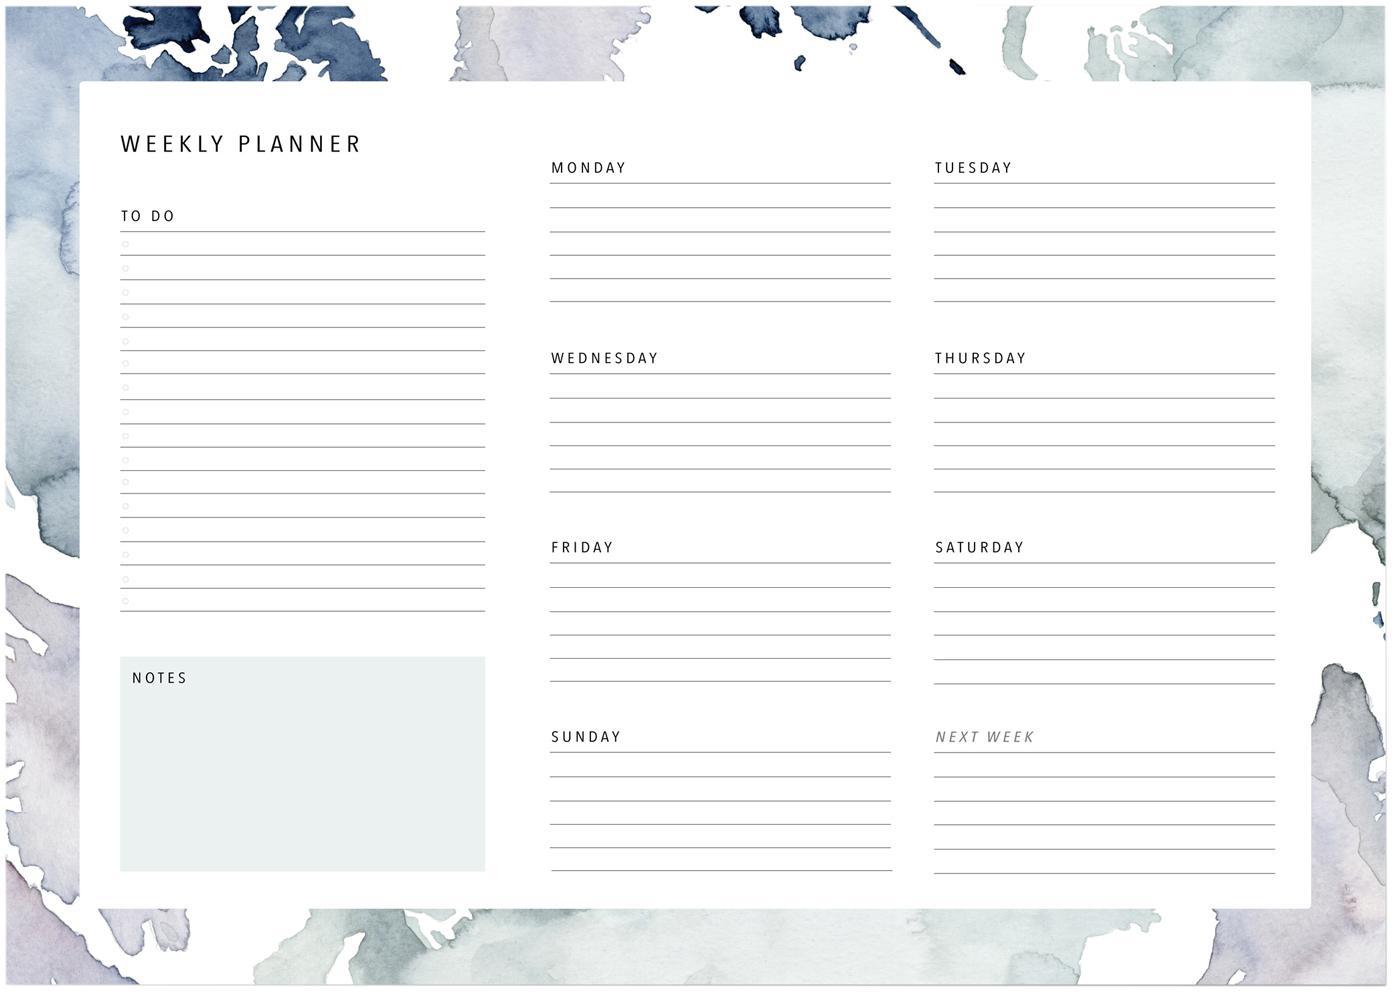 Agenda settimanale Pastel Stains, Carta, Tonalità blu, bianco, Larg. 30 x Alt. 21 cm